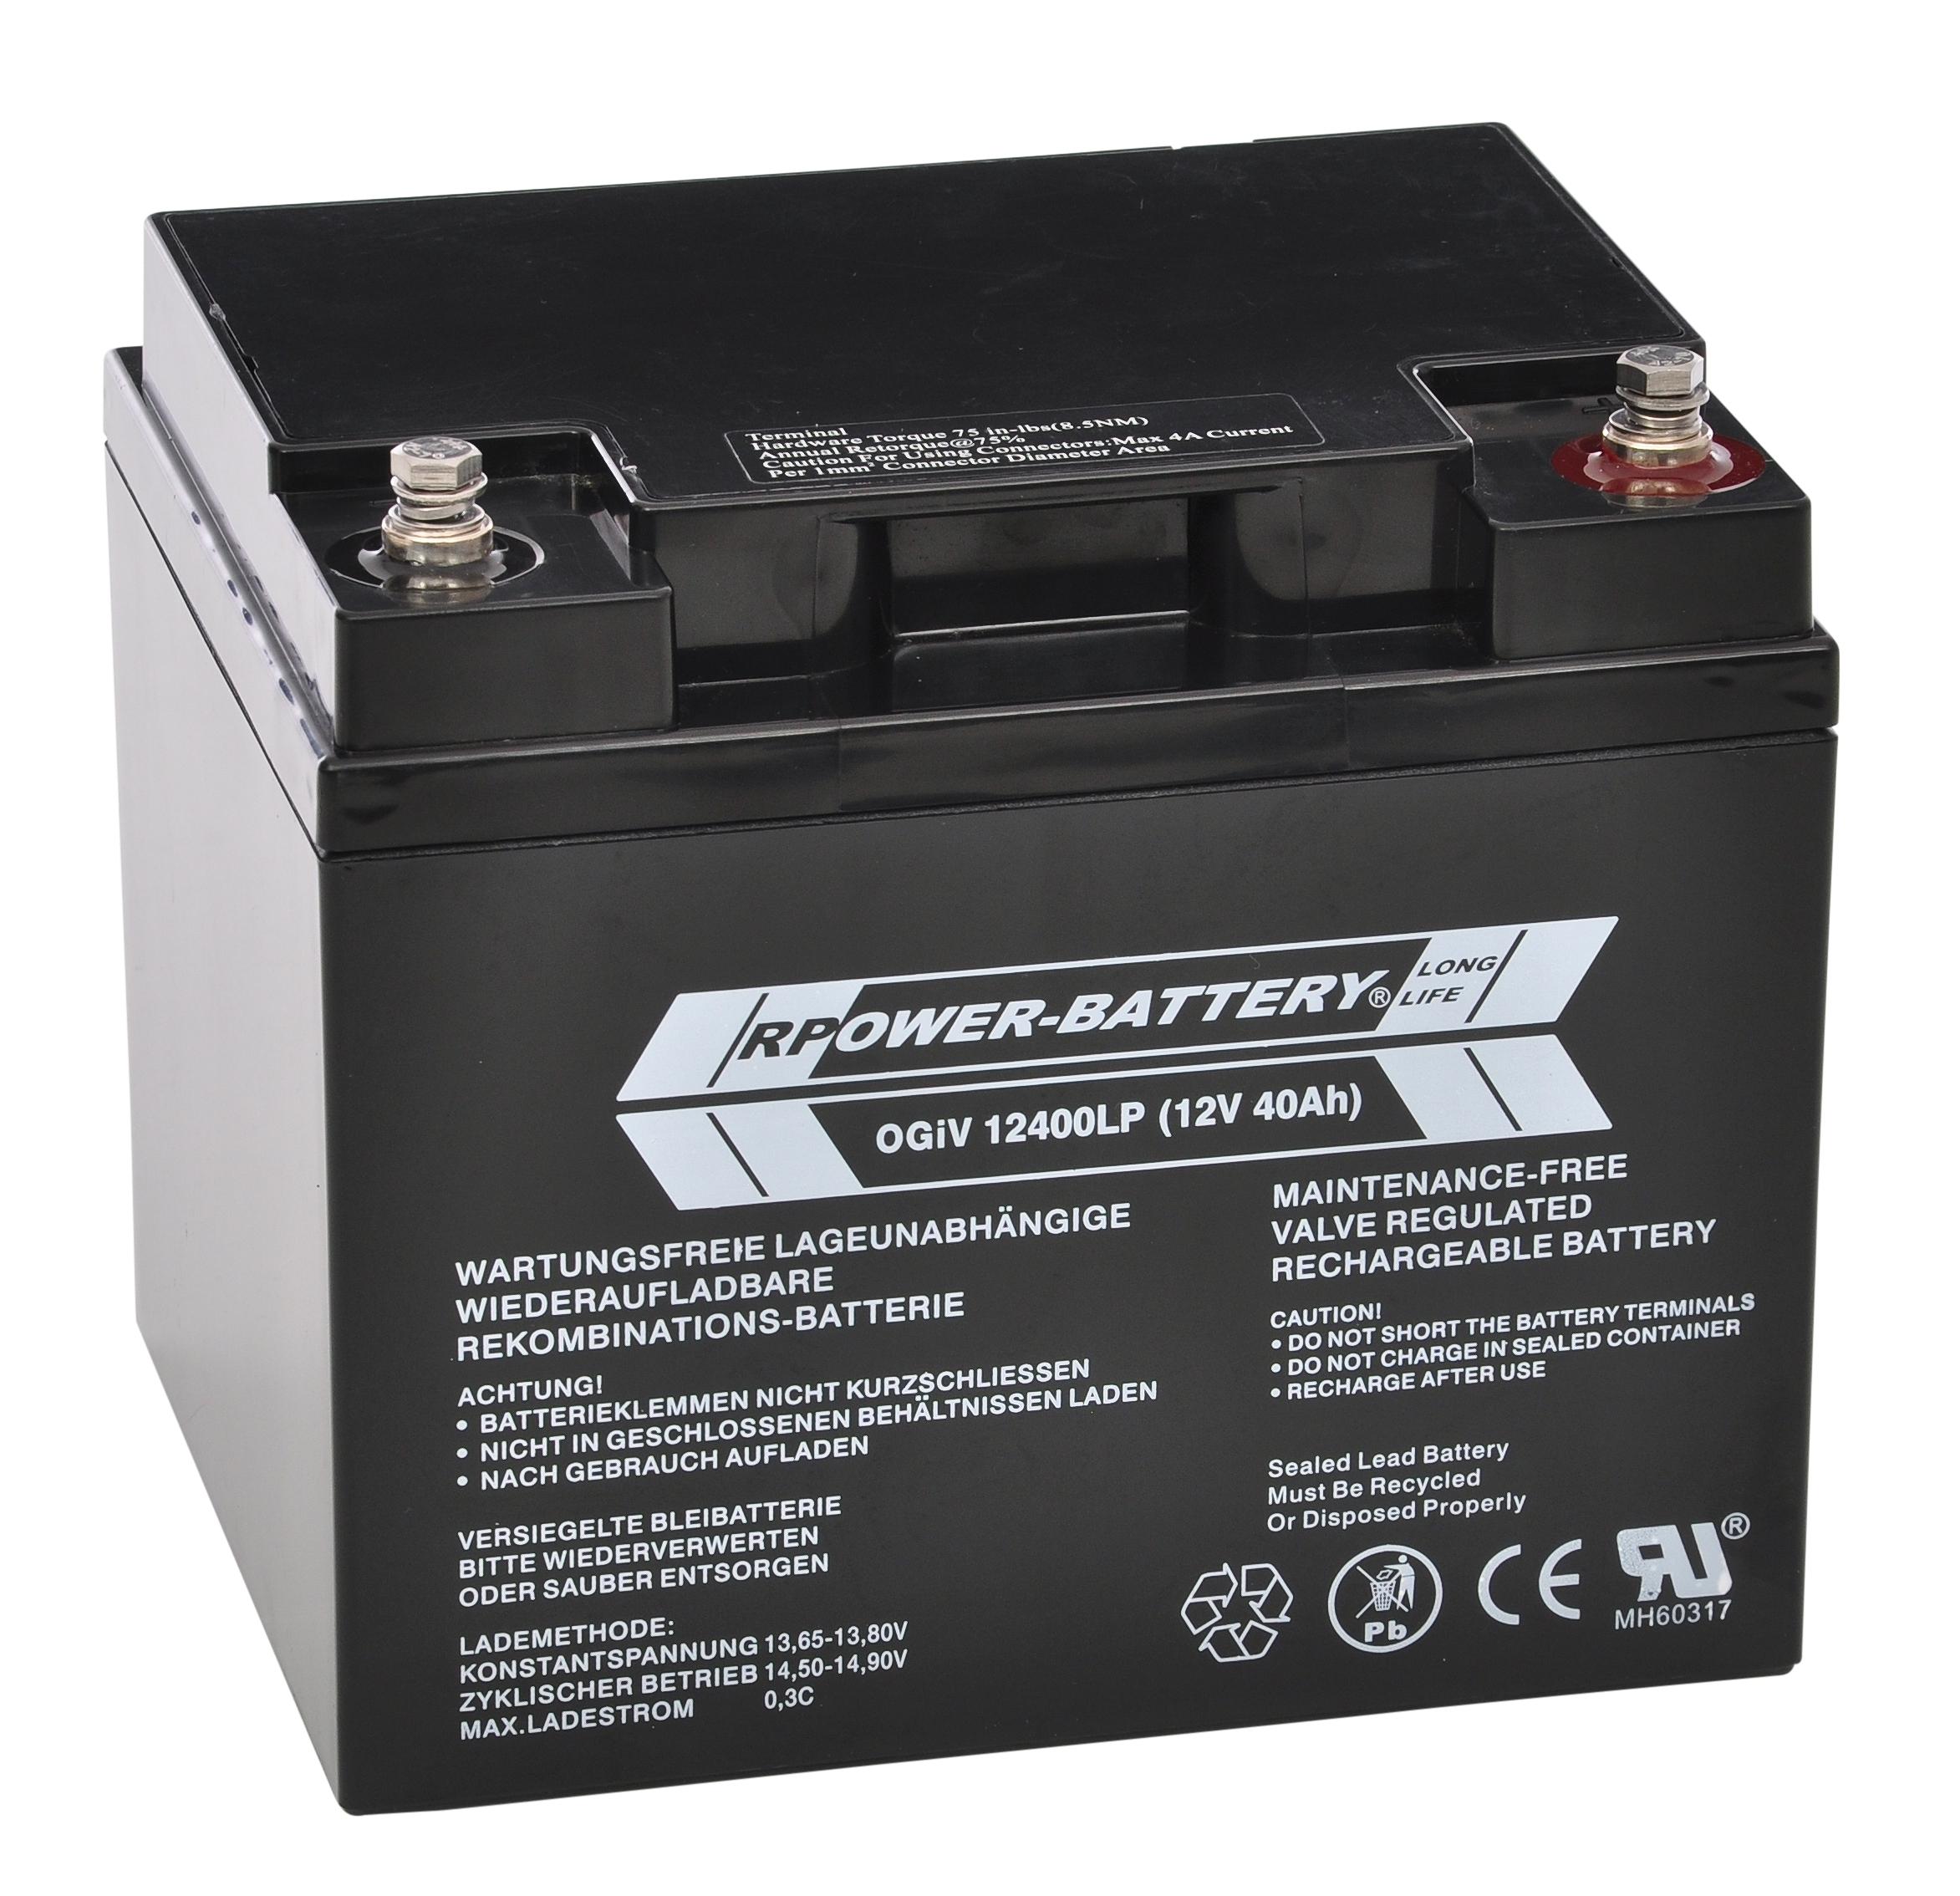 1 Stk Batterie RPower OGiV longlife 10-12 Jahre 12V/42Ah NLBA040---